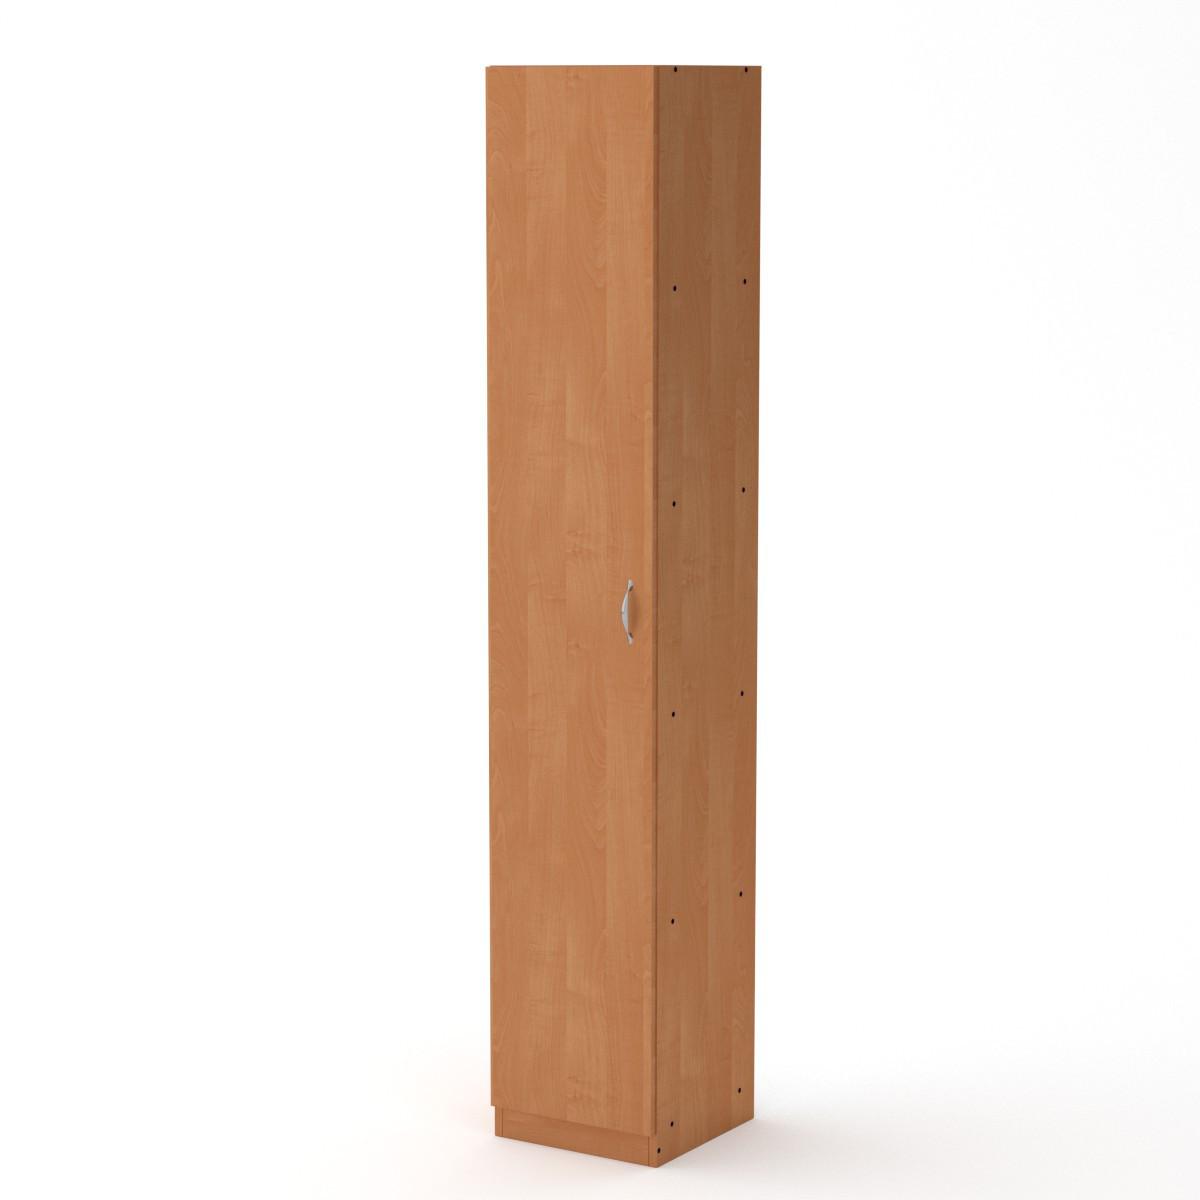 Шкаф книжный КШ-8 ольха Компанит (35х37х195 см)